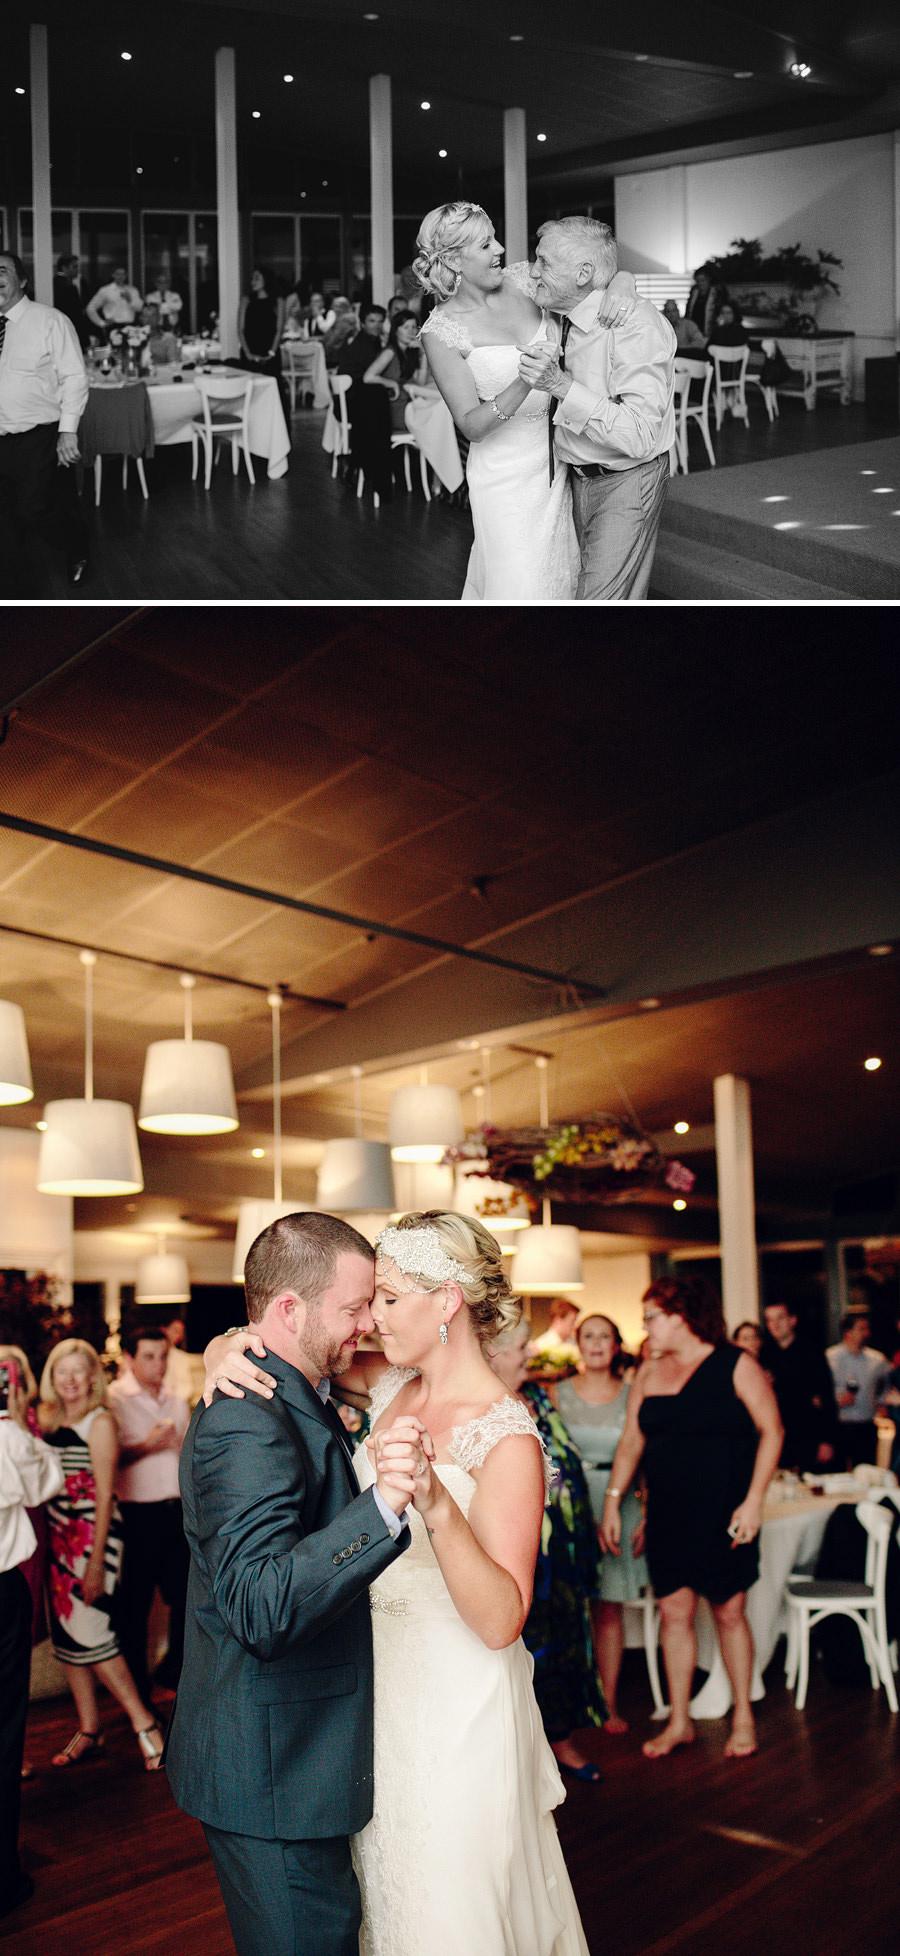 Moby Dicks Wedding Photographer: Reception